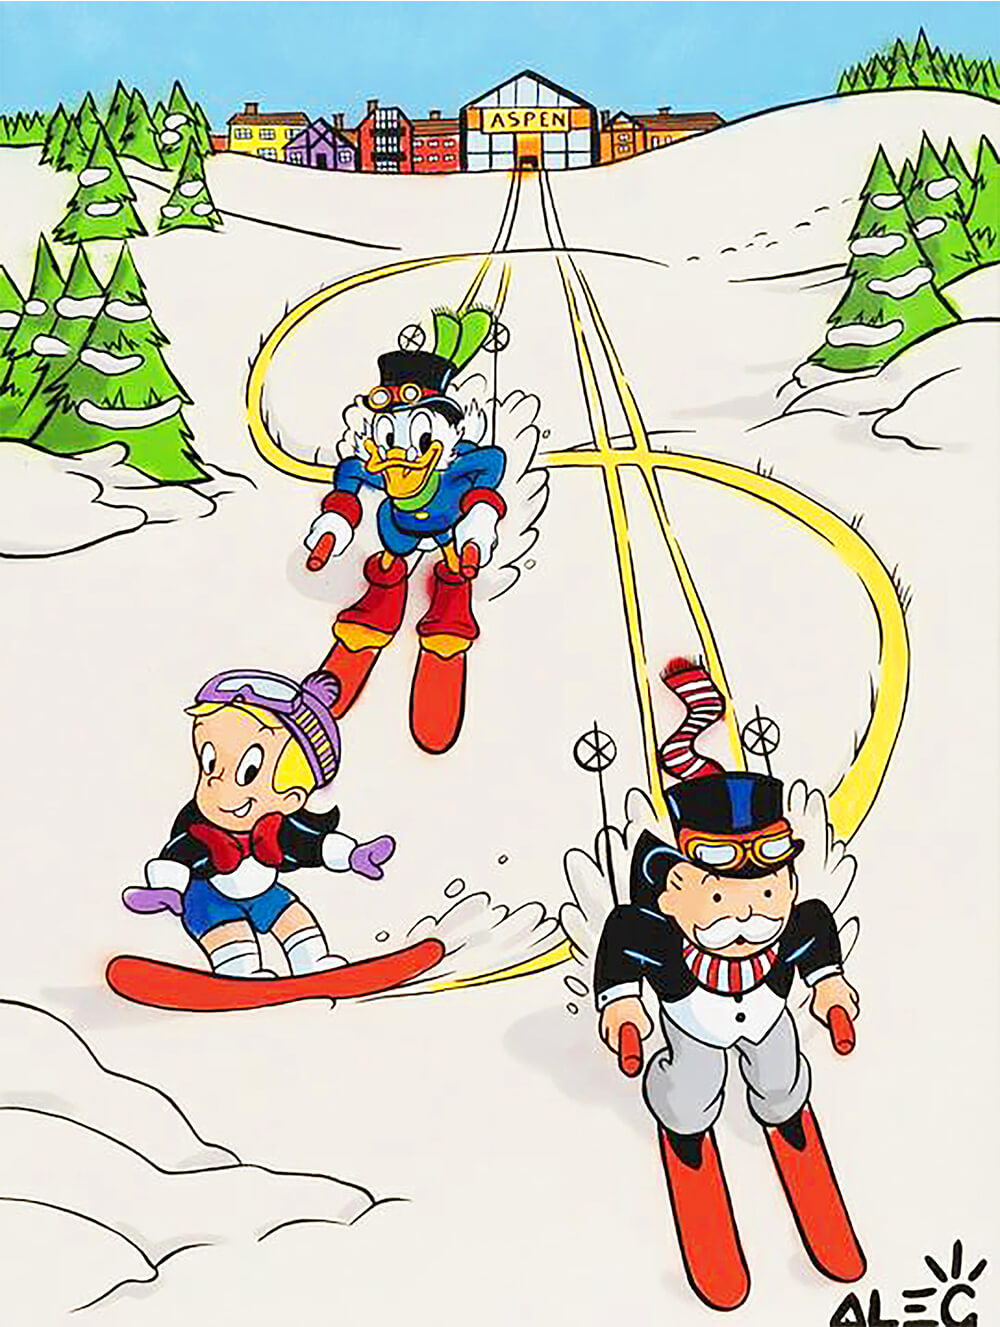 Alec Monopoly - $ Team Skiing In Aspen- Eden Gallery